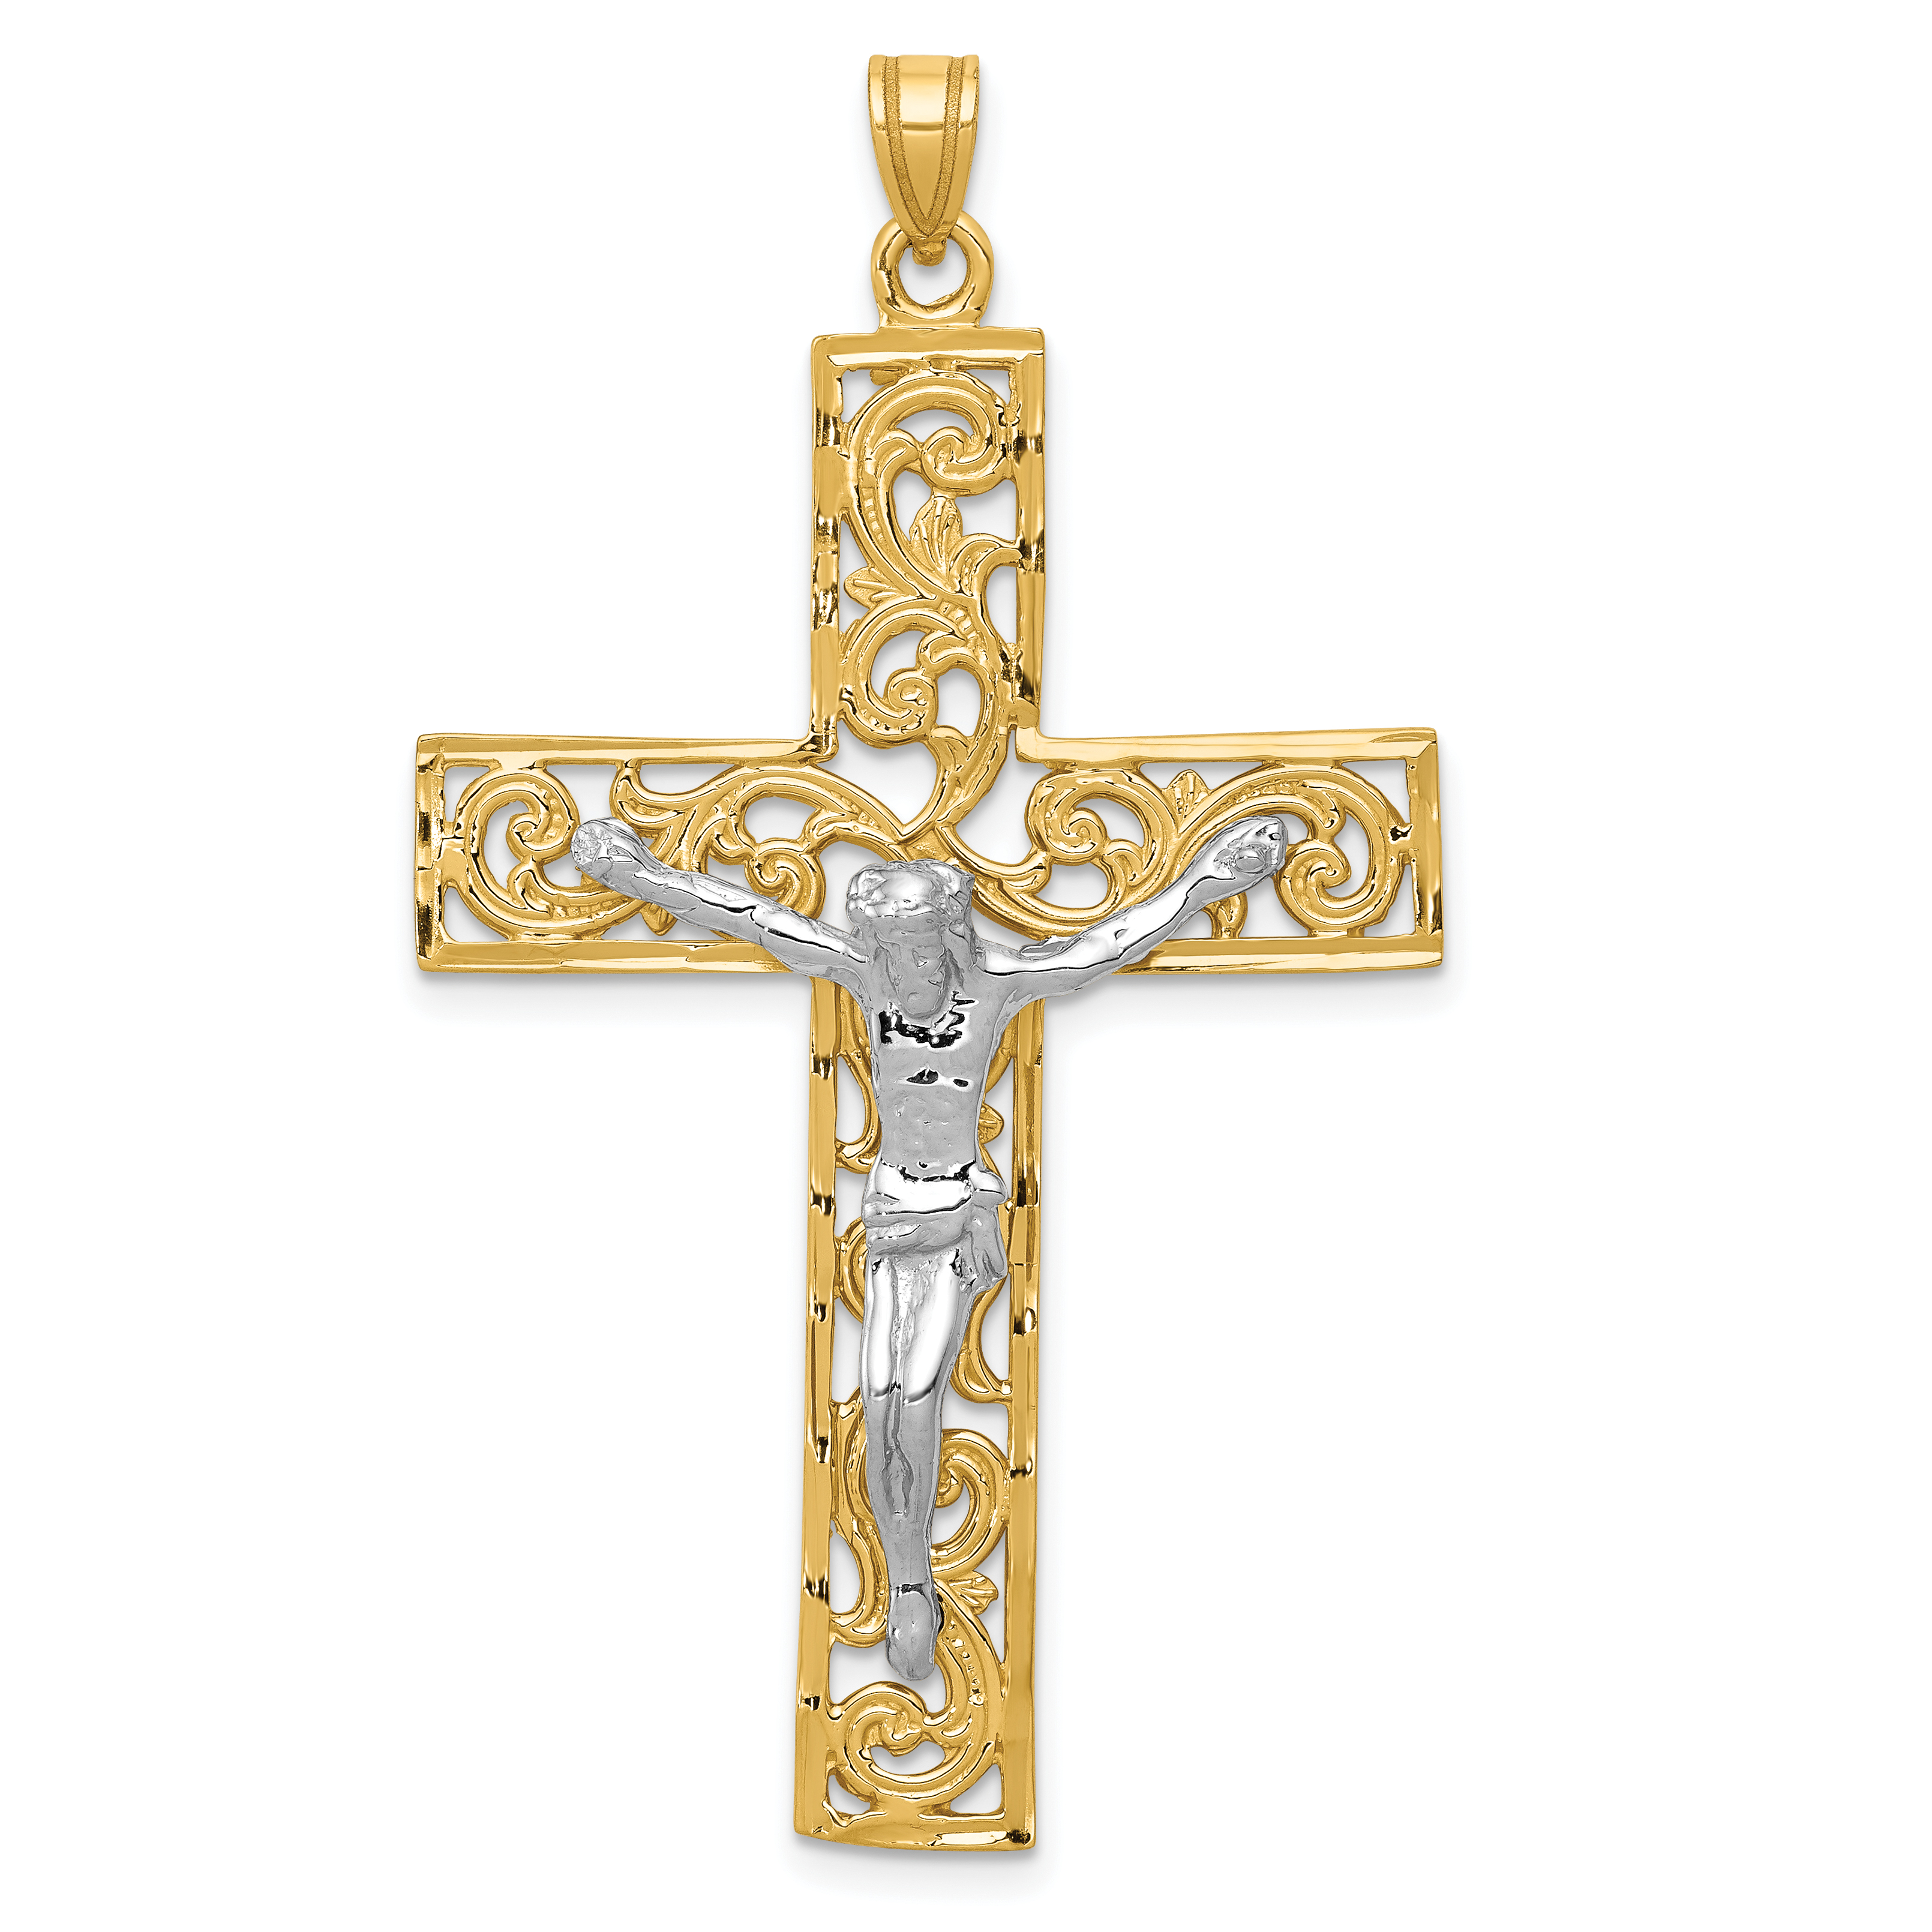 14k Two-tone Diamond-cut Crucifix Pendant. Weight: 4.15, Length: 56, Width: 30